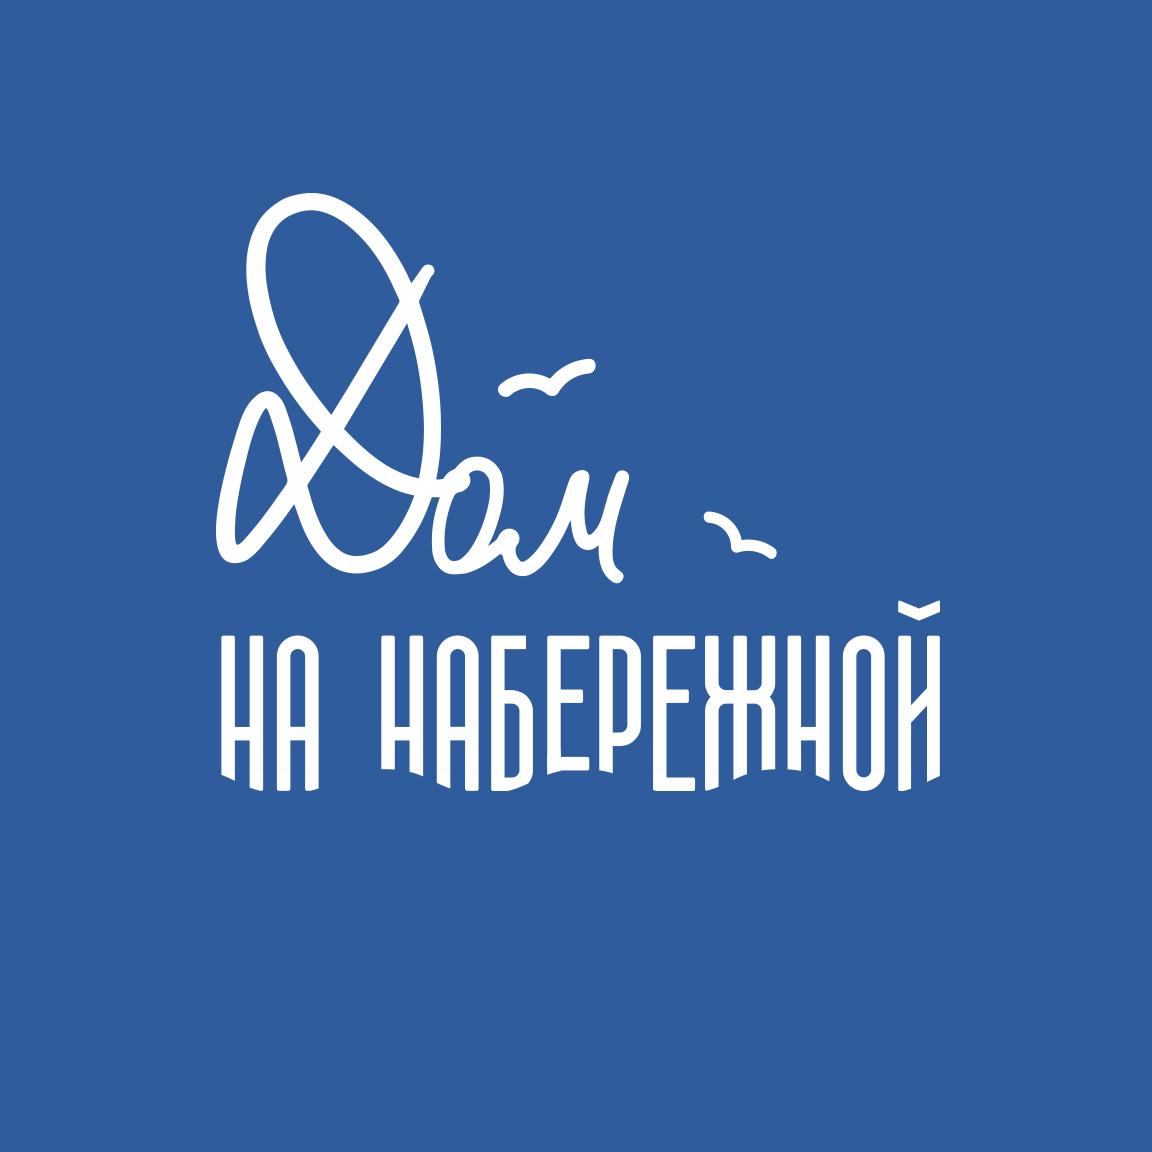 РАЗРАБОТКА логотипа для ЖИЛОГО КОМПЛЕКСА премиум В АНАПЕ.  фото f_6485de7f1c099b0d.jpg